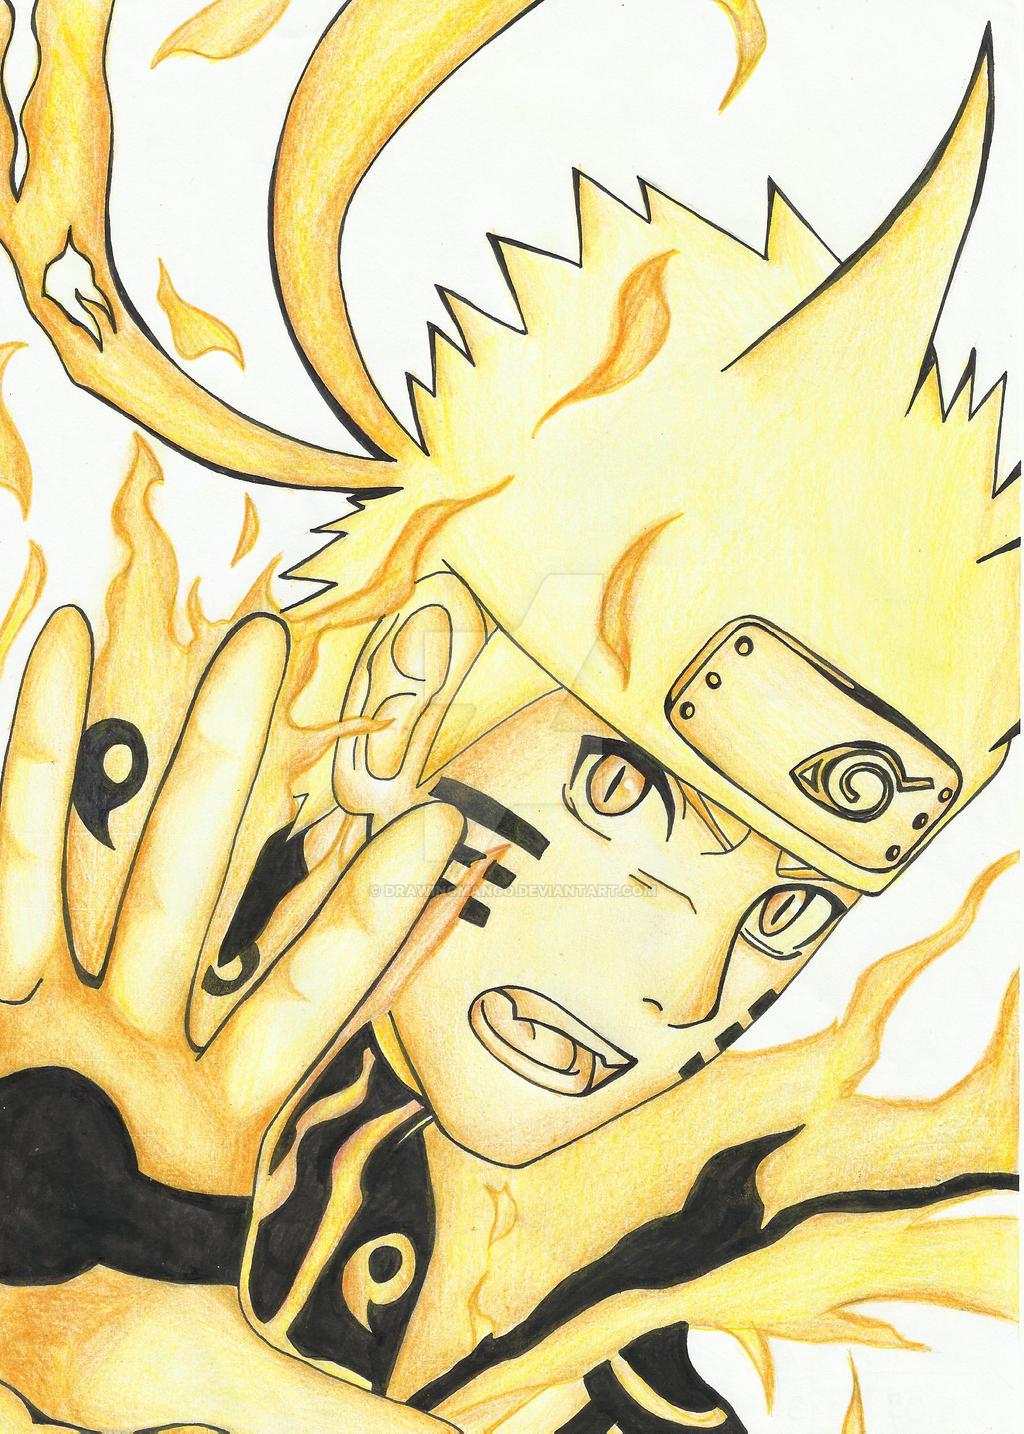 Naruto bijuu mode by Drawingmango on DeviantArt